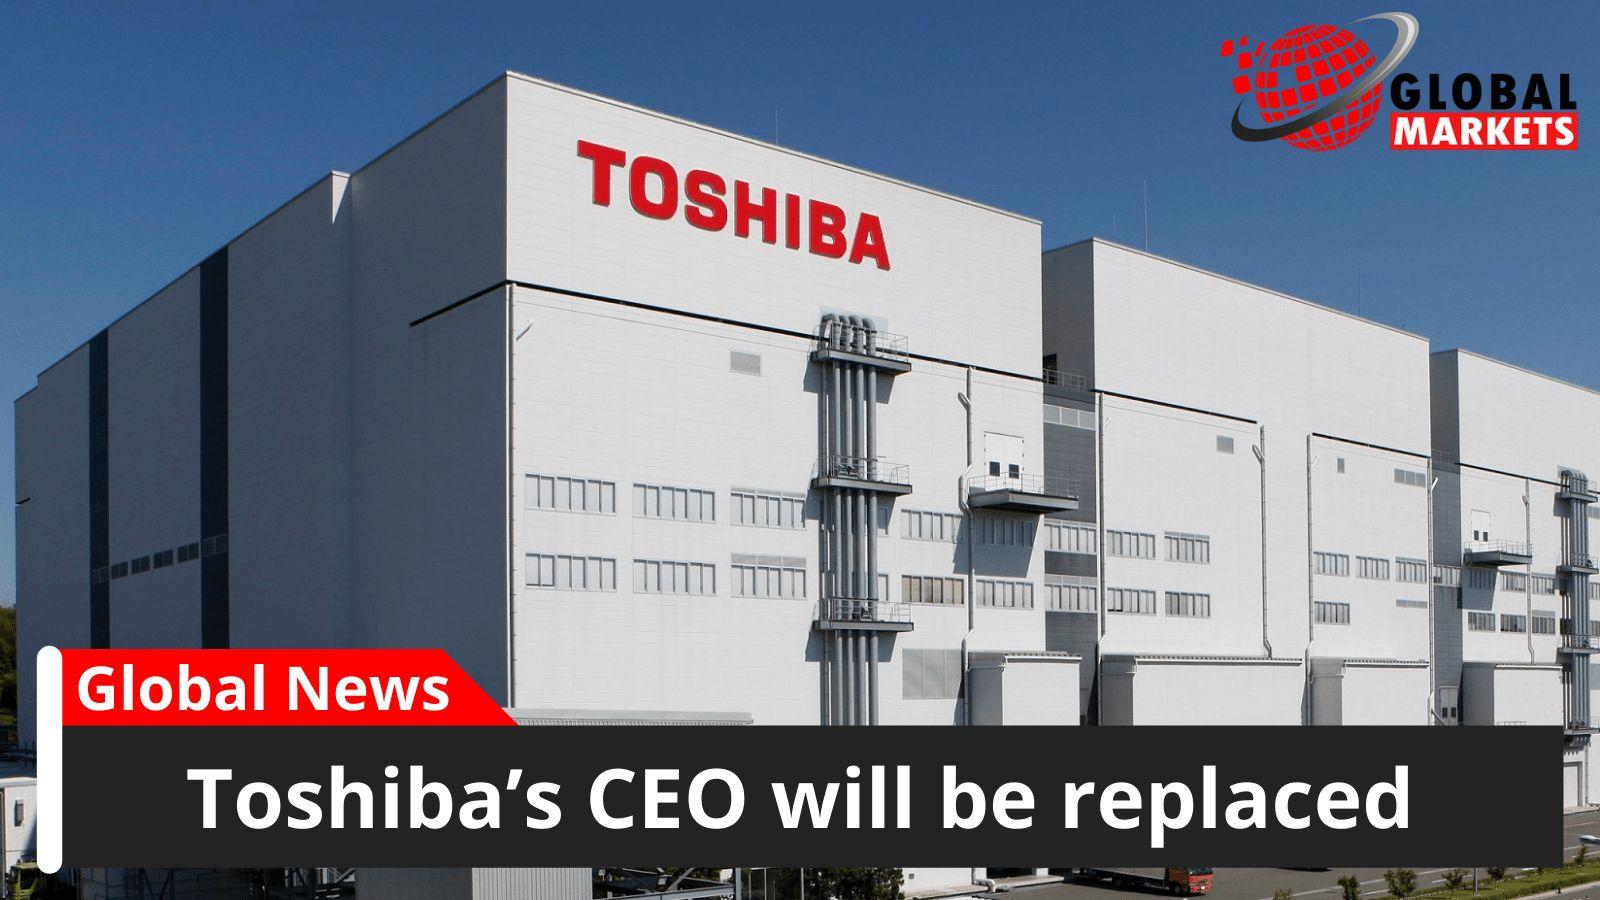 Toshiba's CEO will be replaced by Satoshi Tsunakawa